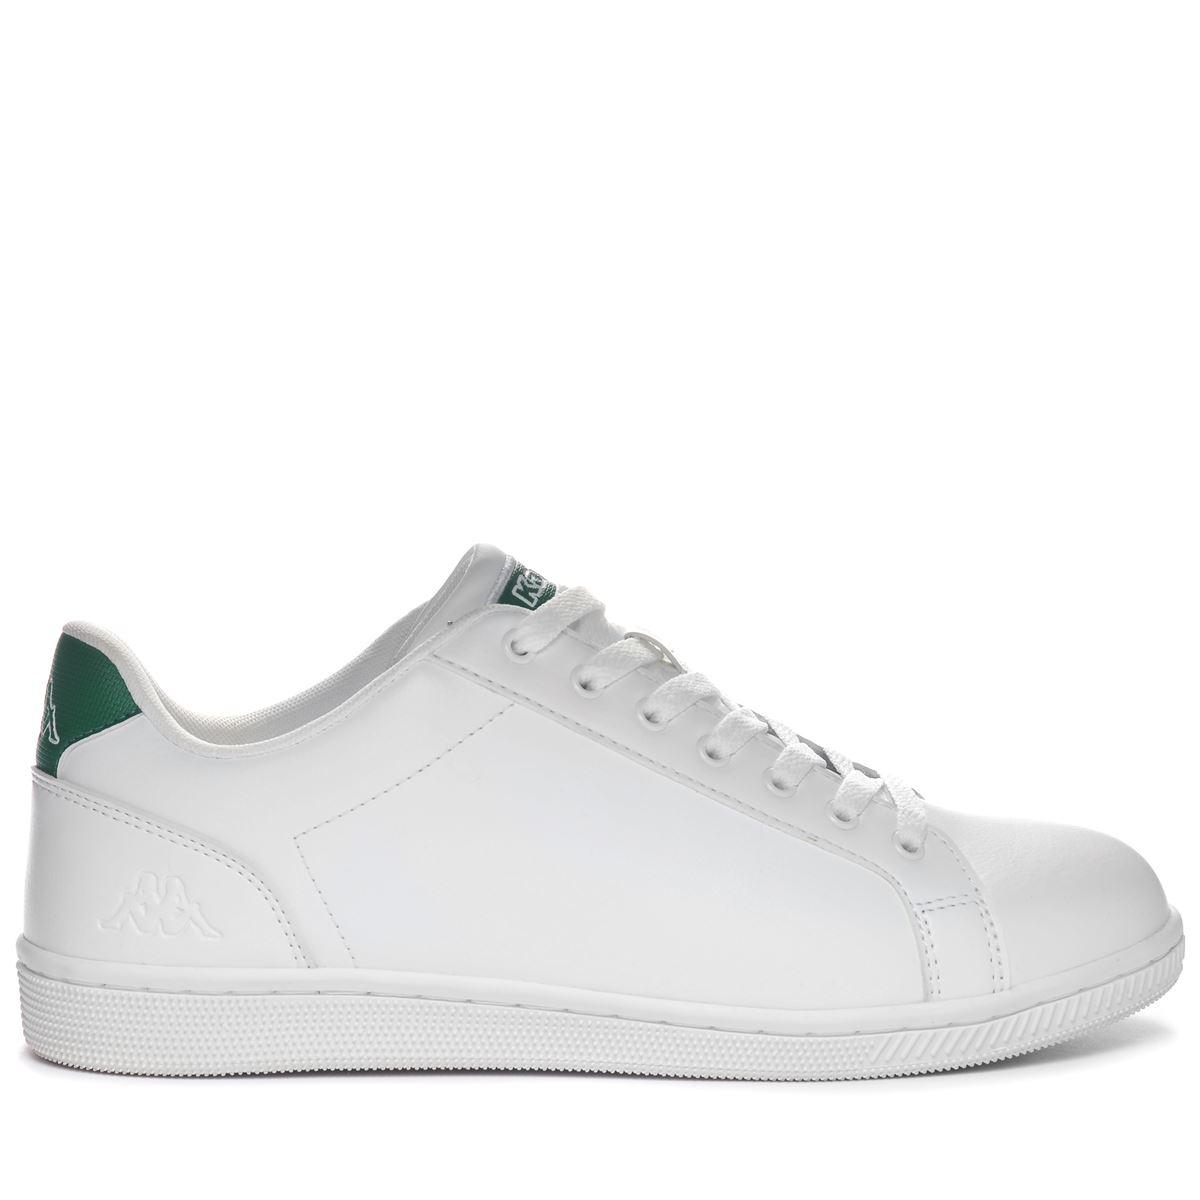 Kappa-Scarpe-Sneakers-Uomo-Donna-LOGO-GALTER-5-Camminata-Basso miniatuur 7